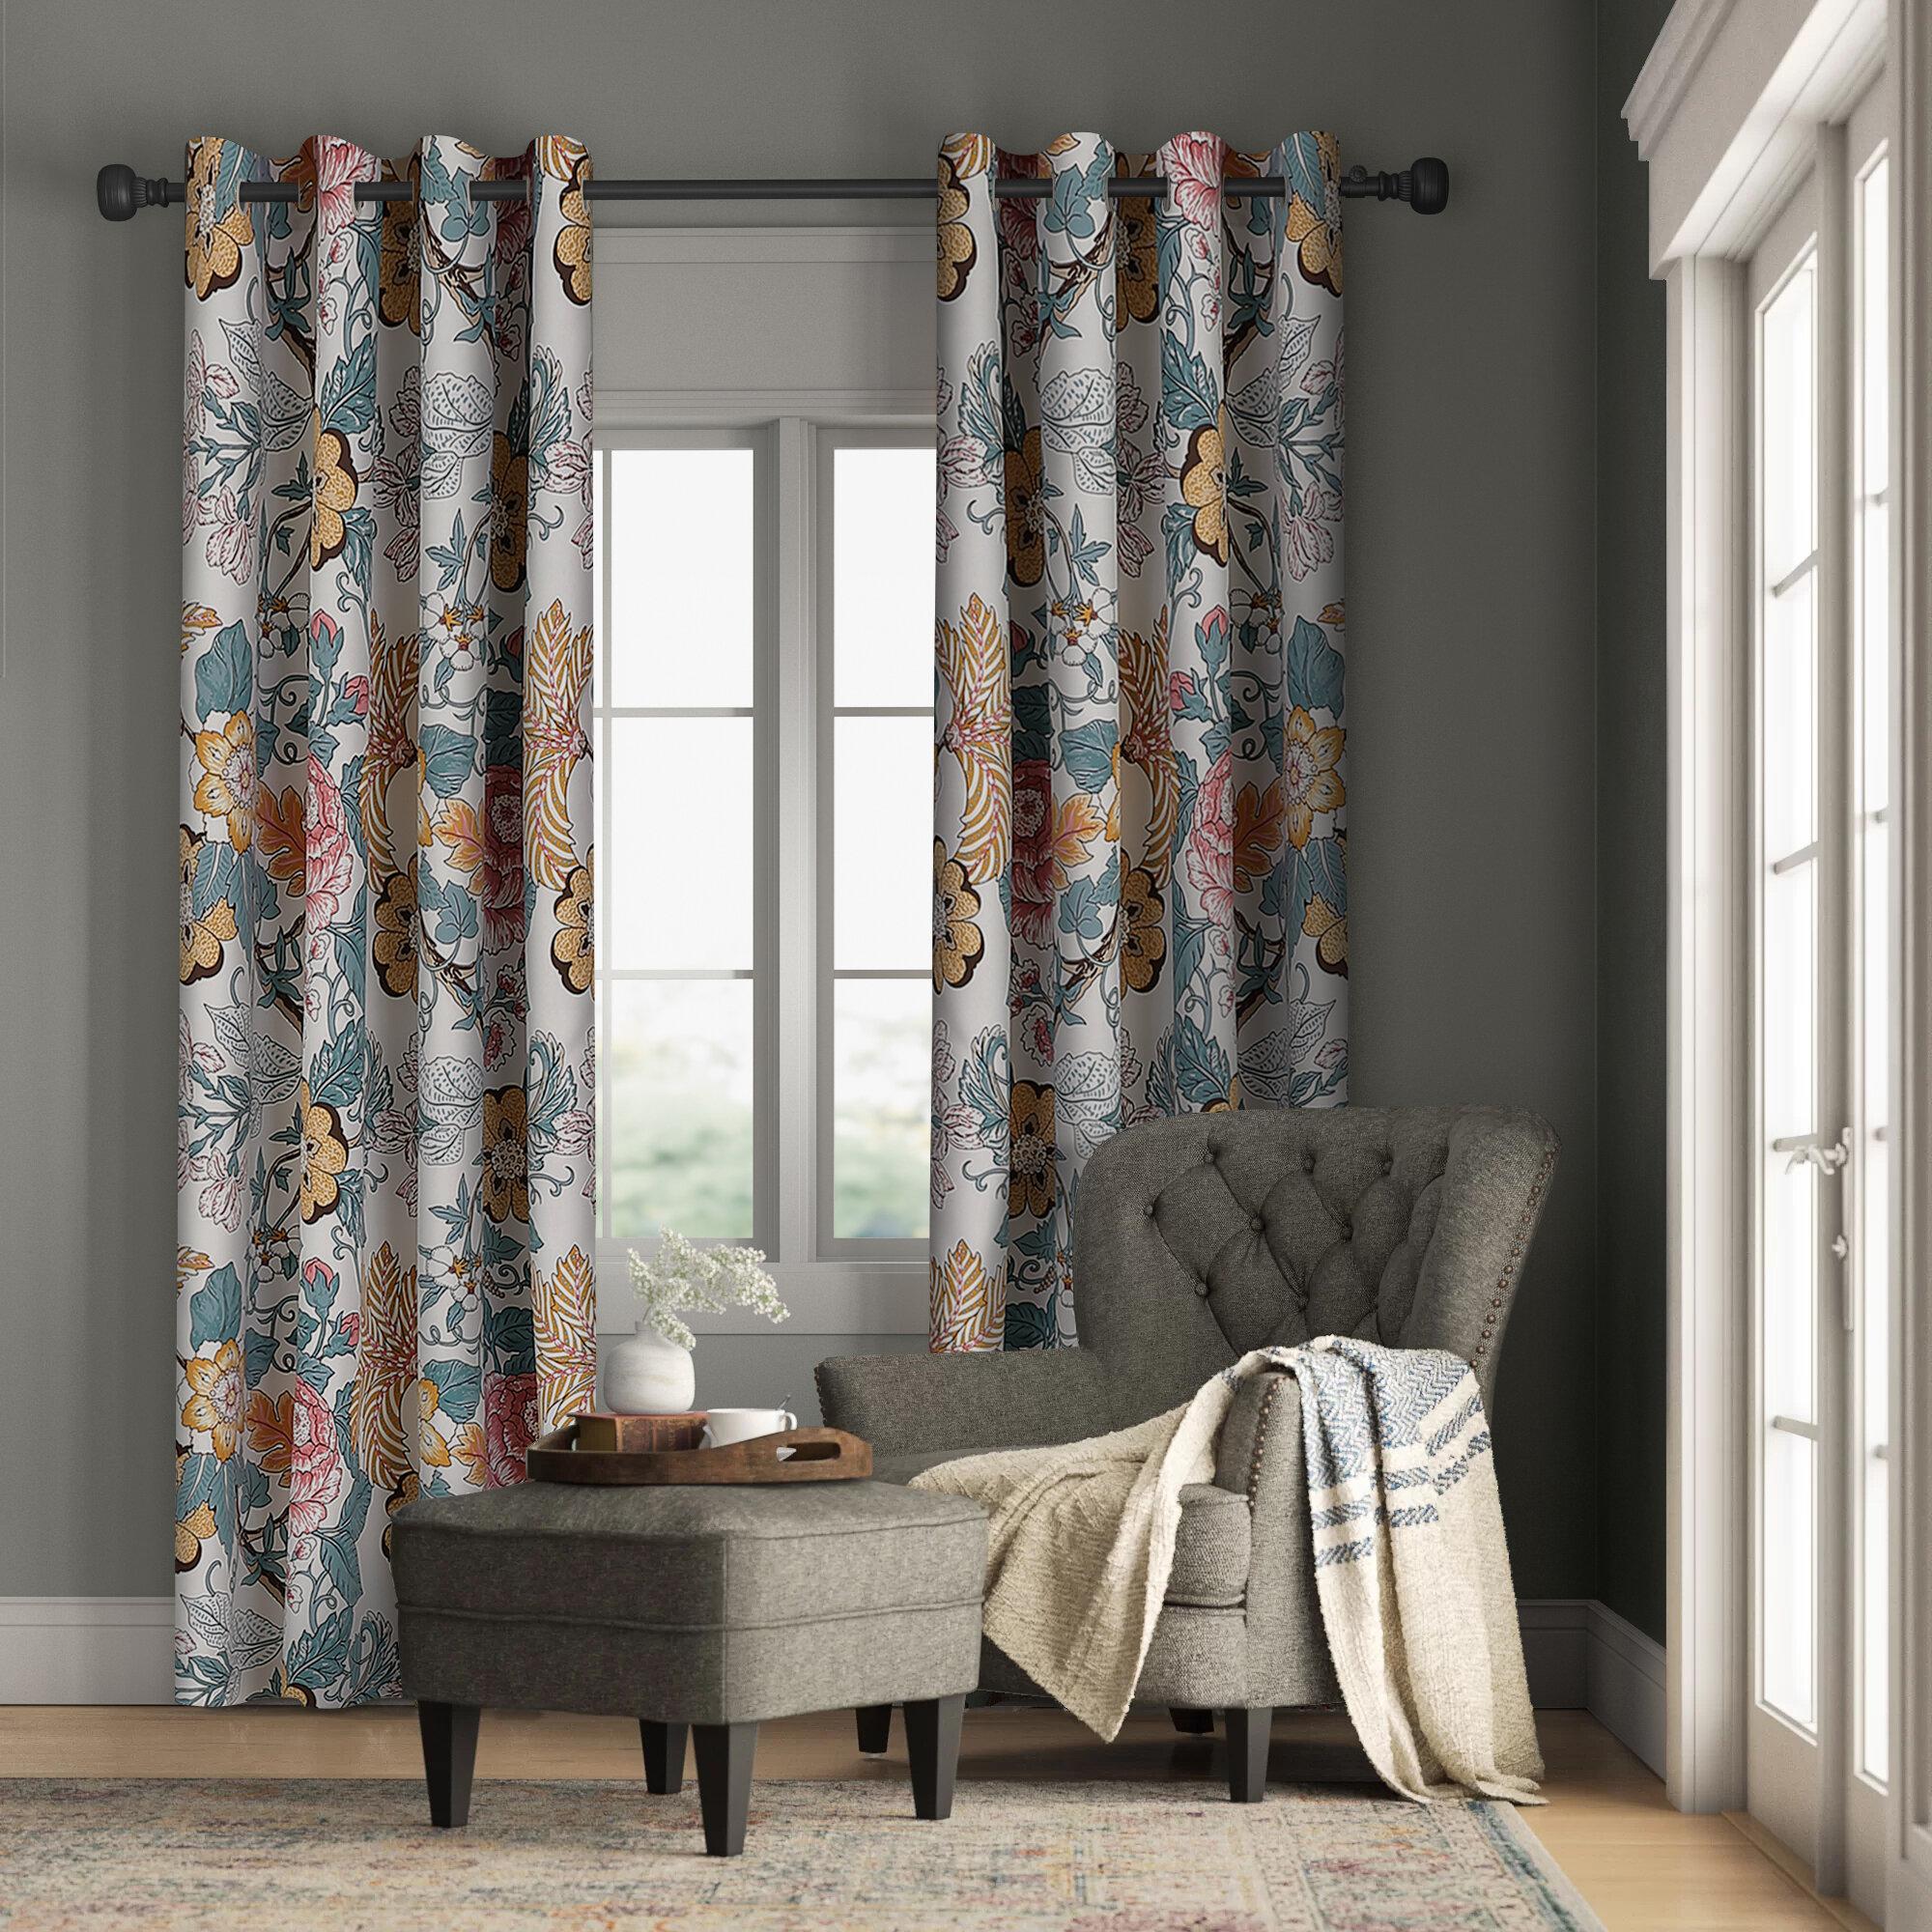 Crookston Floral Room Darkening Thermal Rod Pocket Curtain Panels Reviews Birch Lane